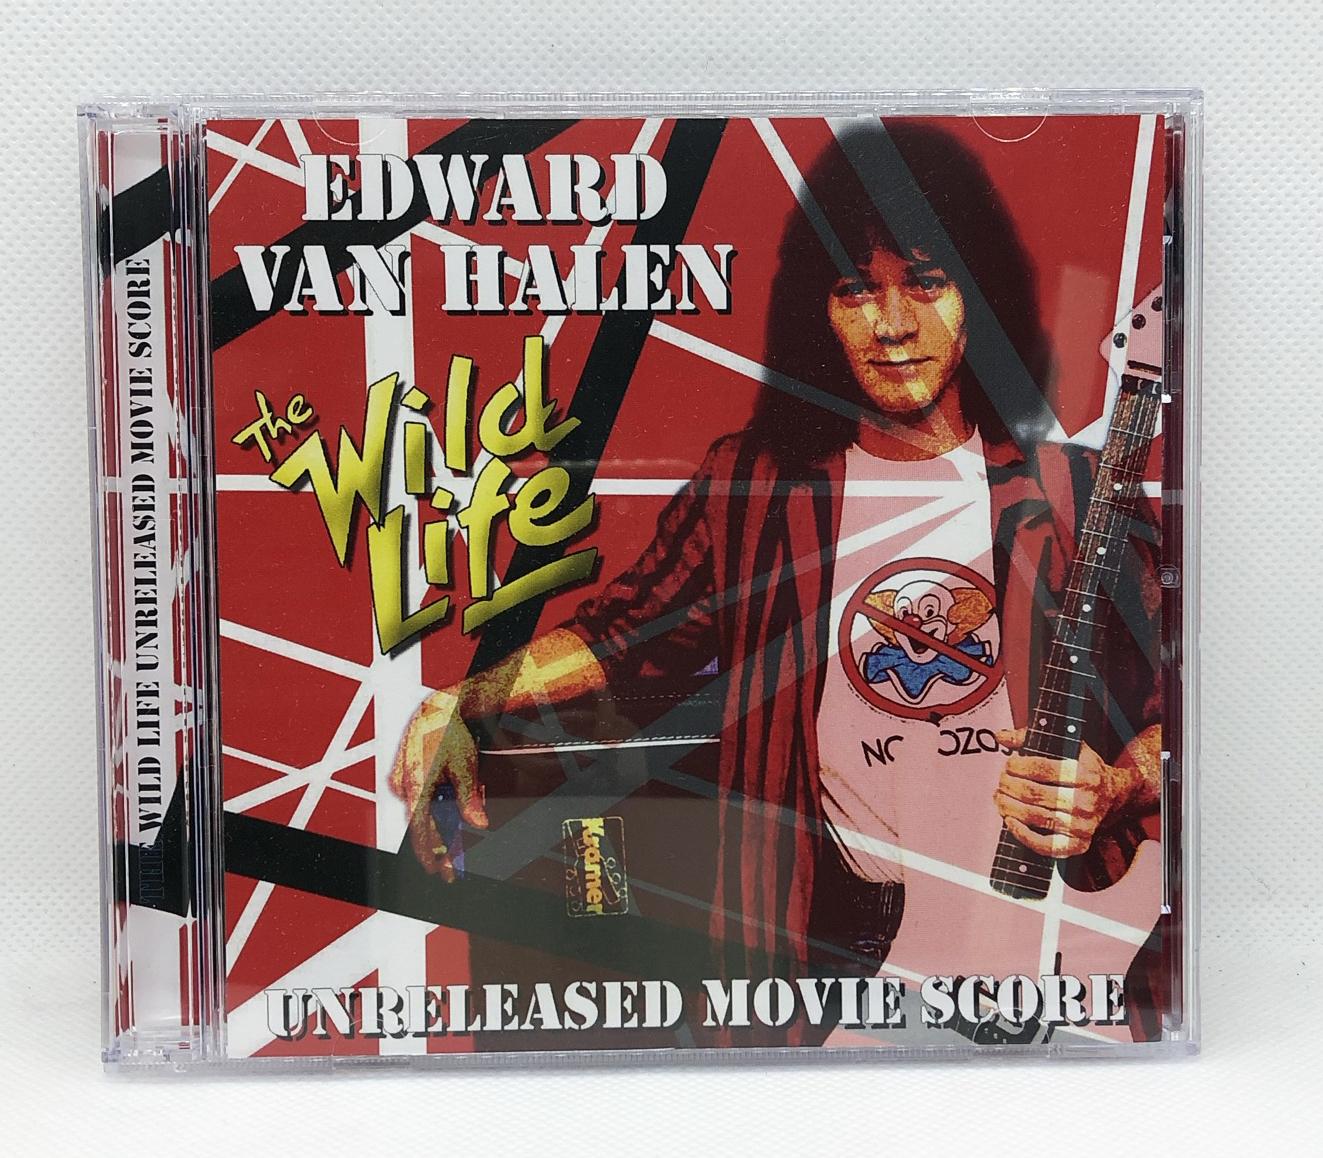 EDWARD VAN HALEN - THE WILD LIFE UNRELEASED SCORE (1CD)